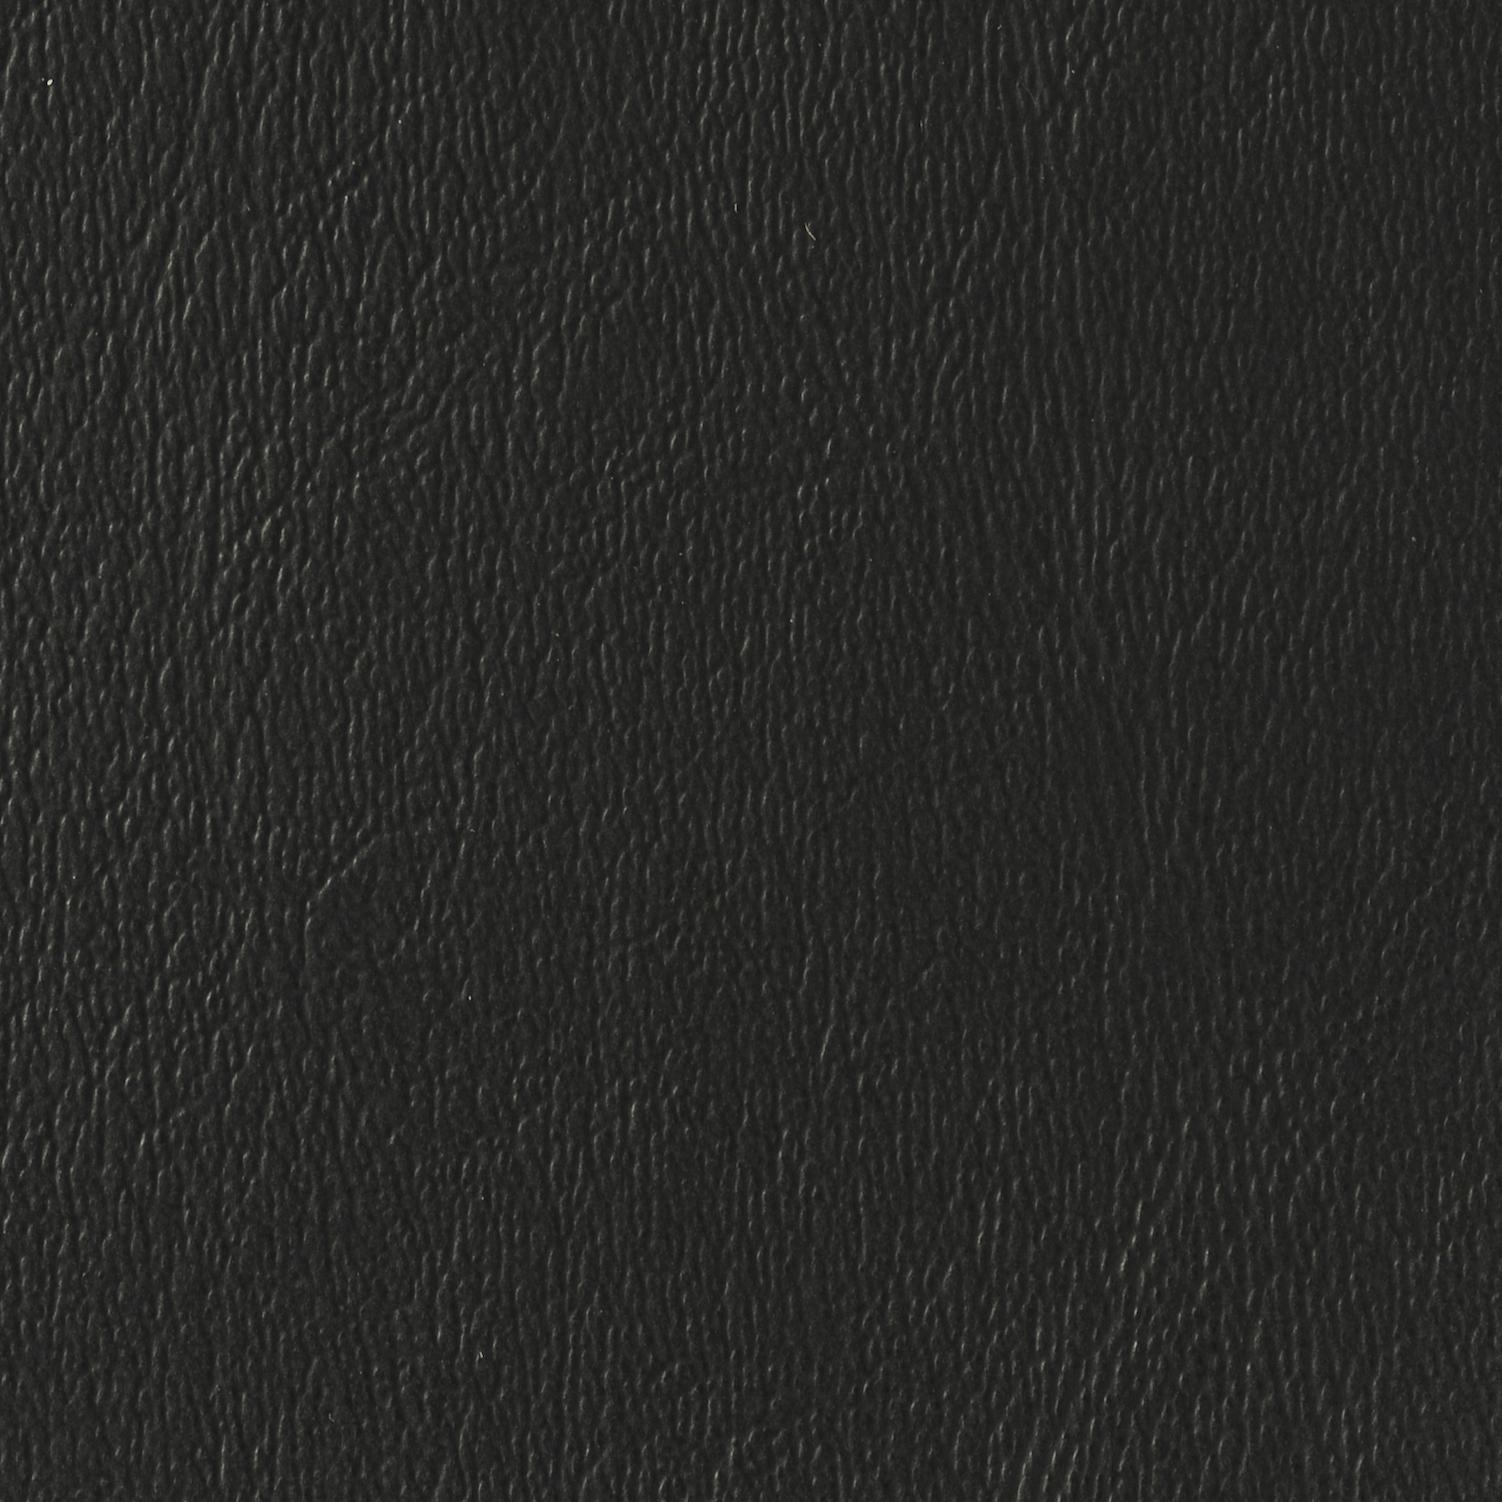 BLACK SATIN   PR-40